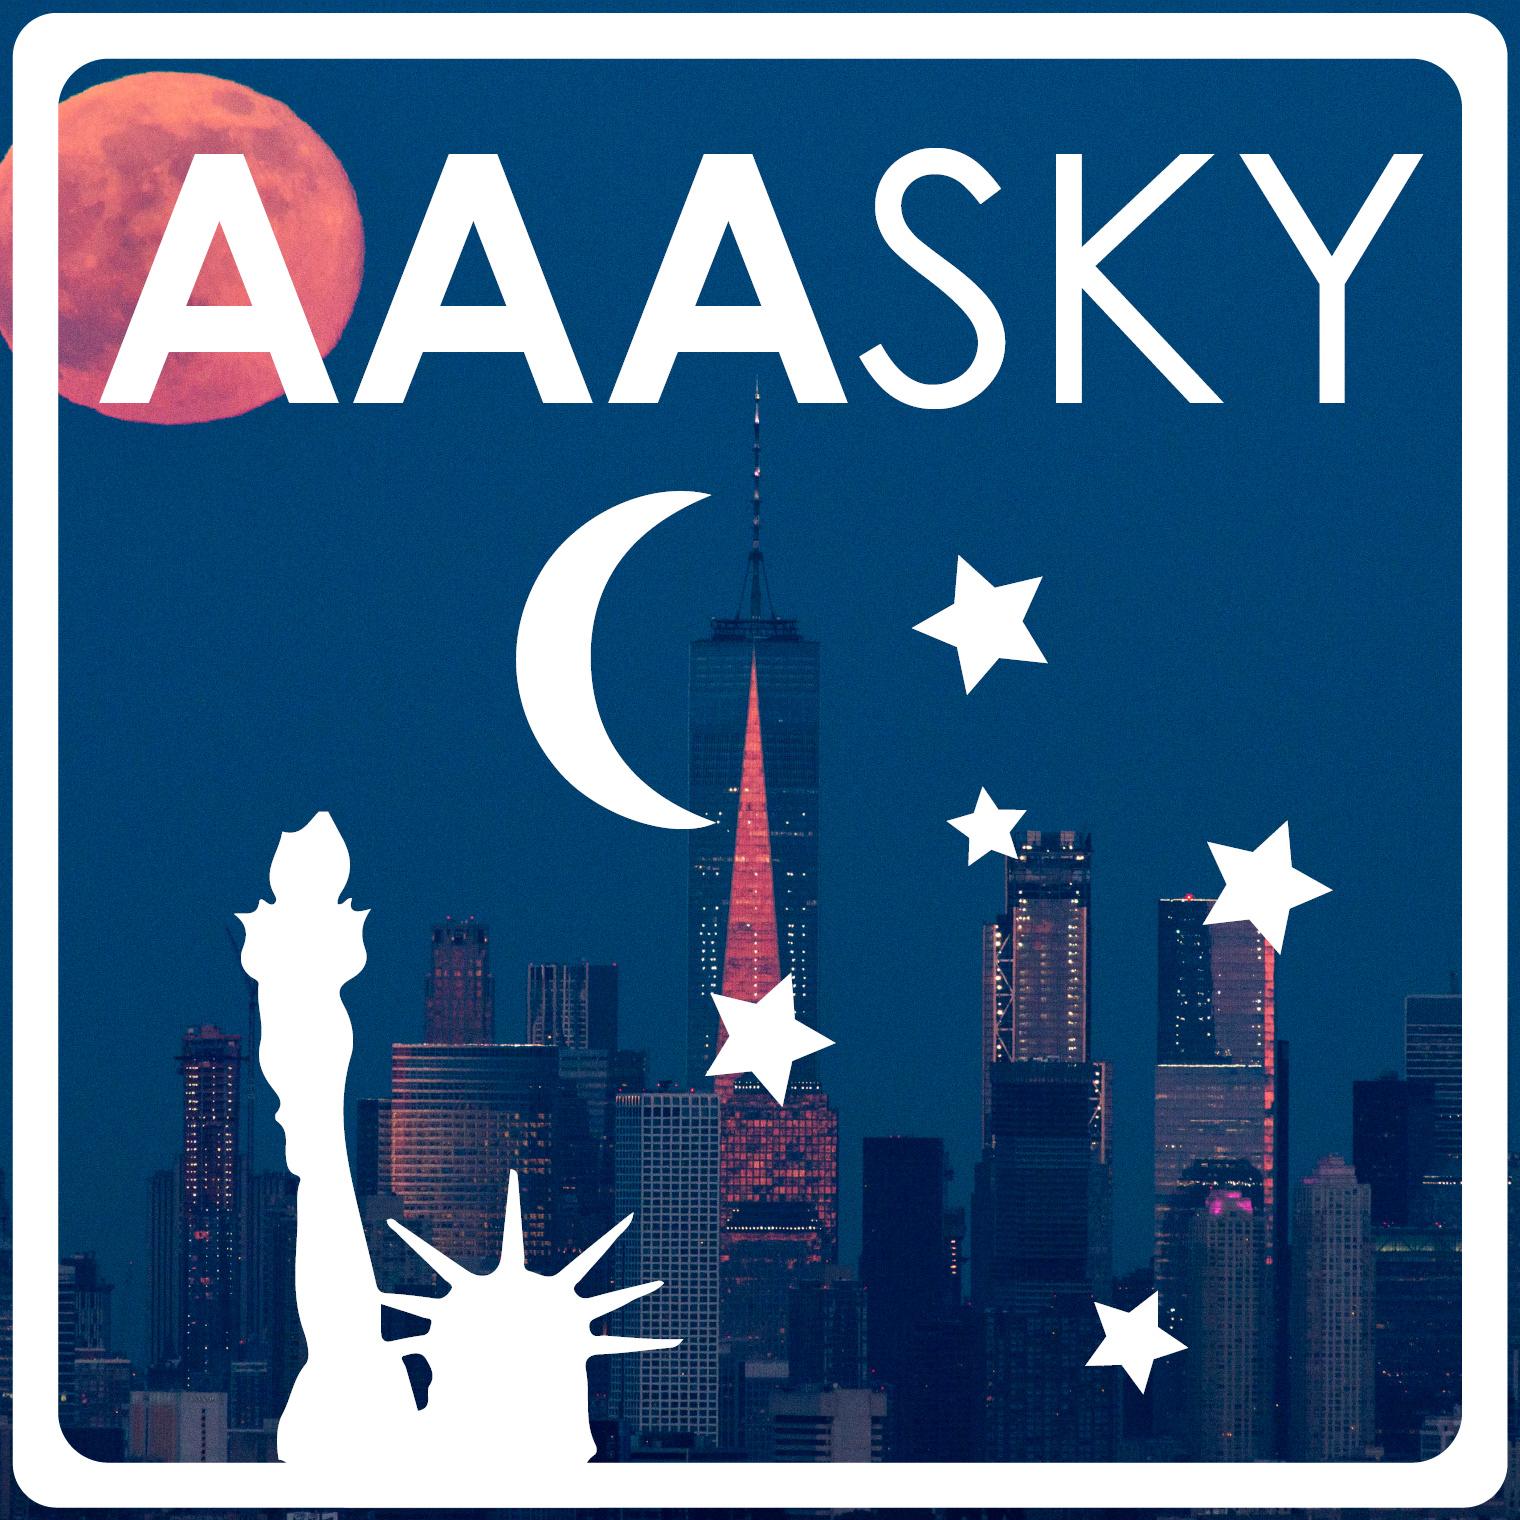 AAASky